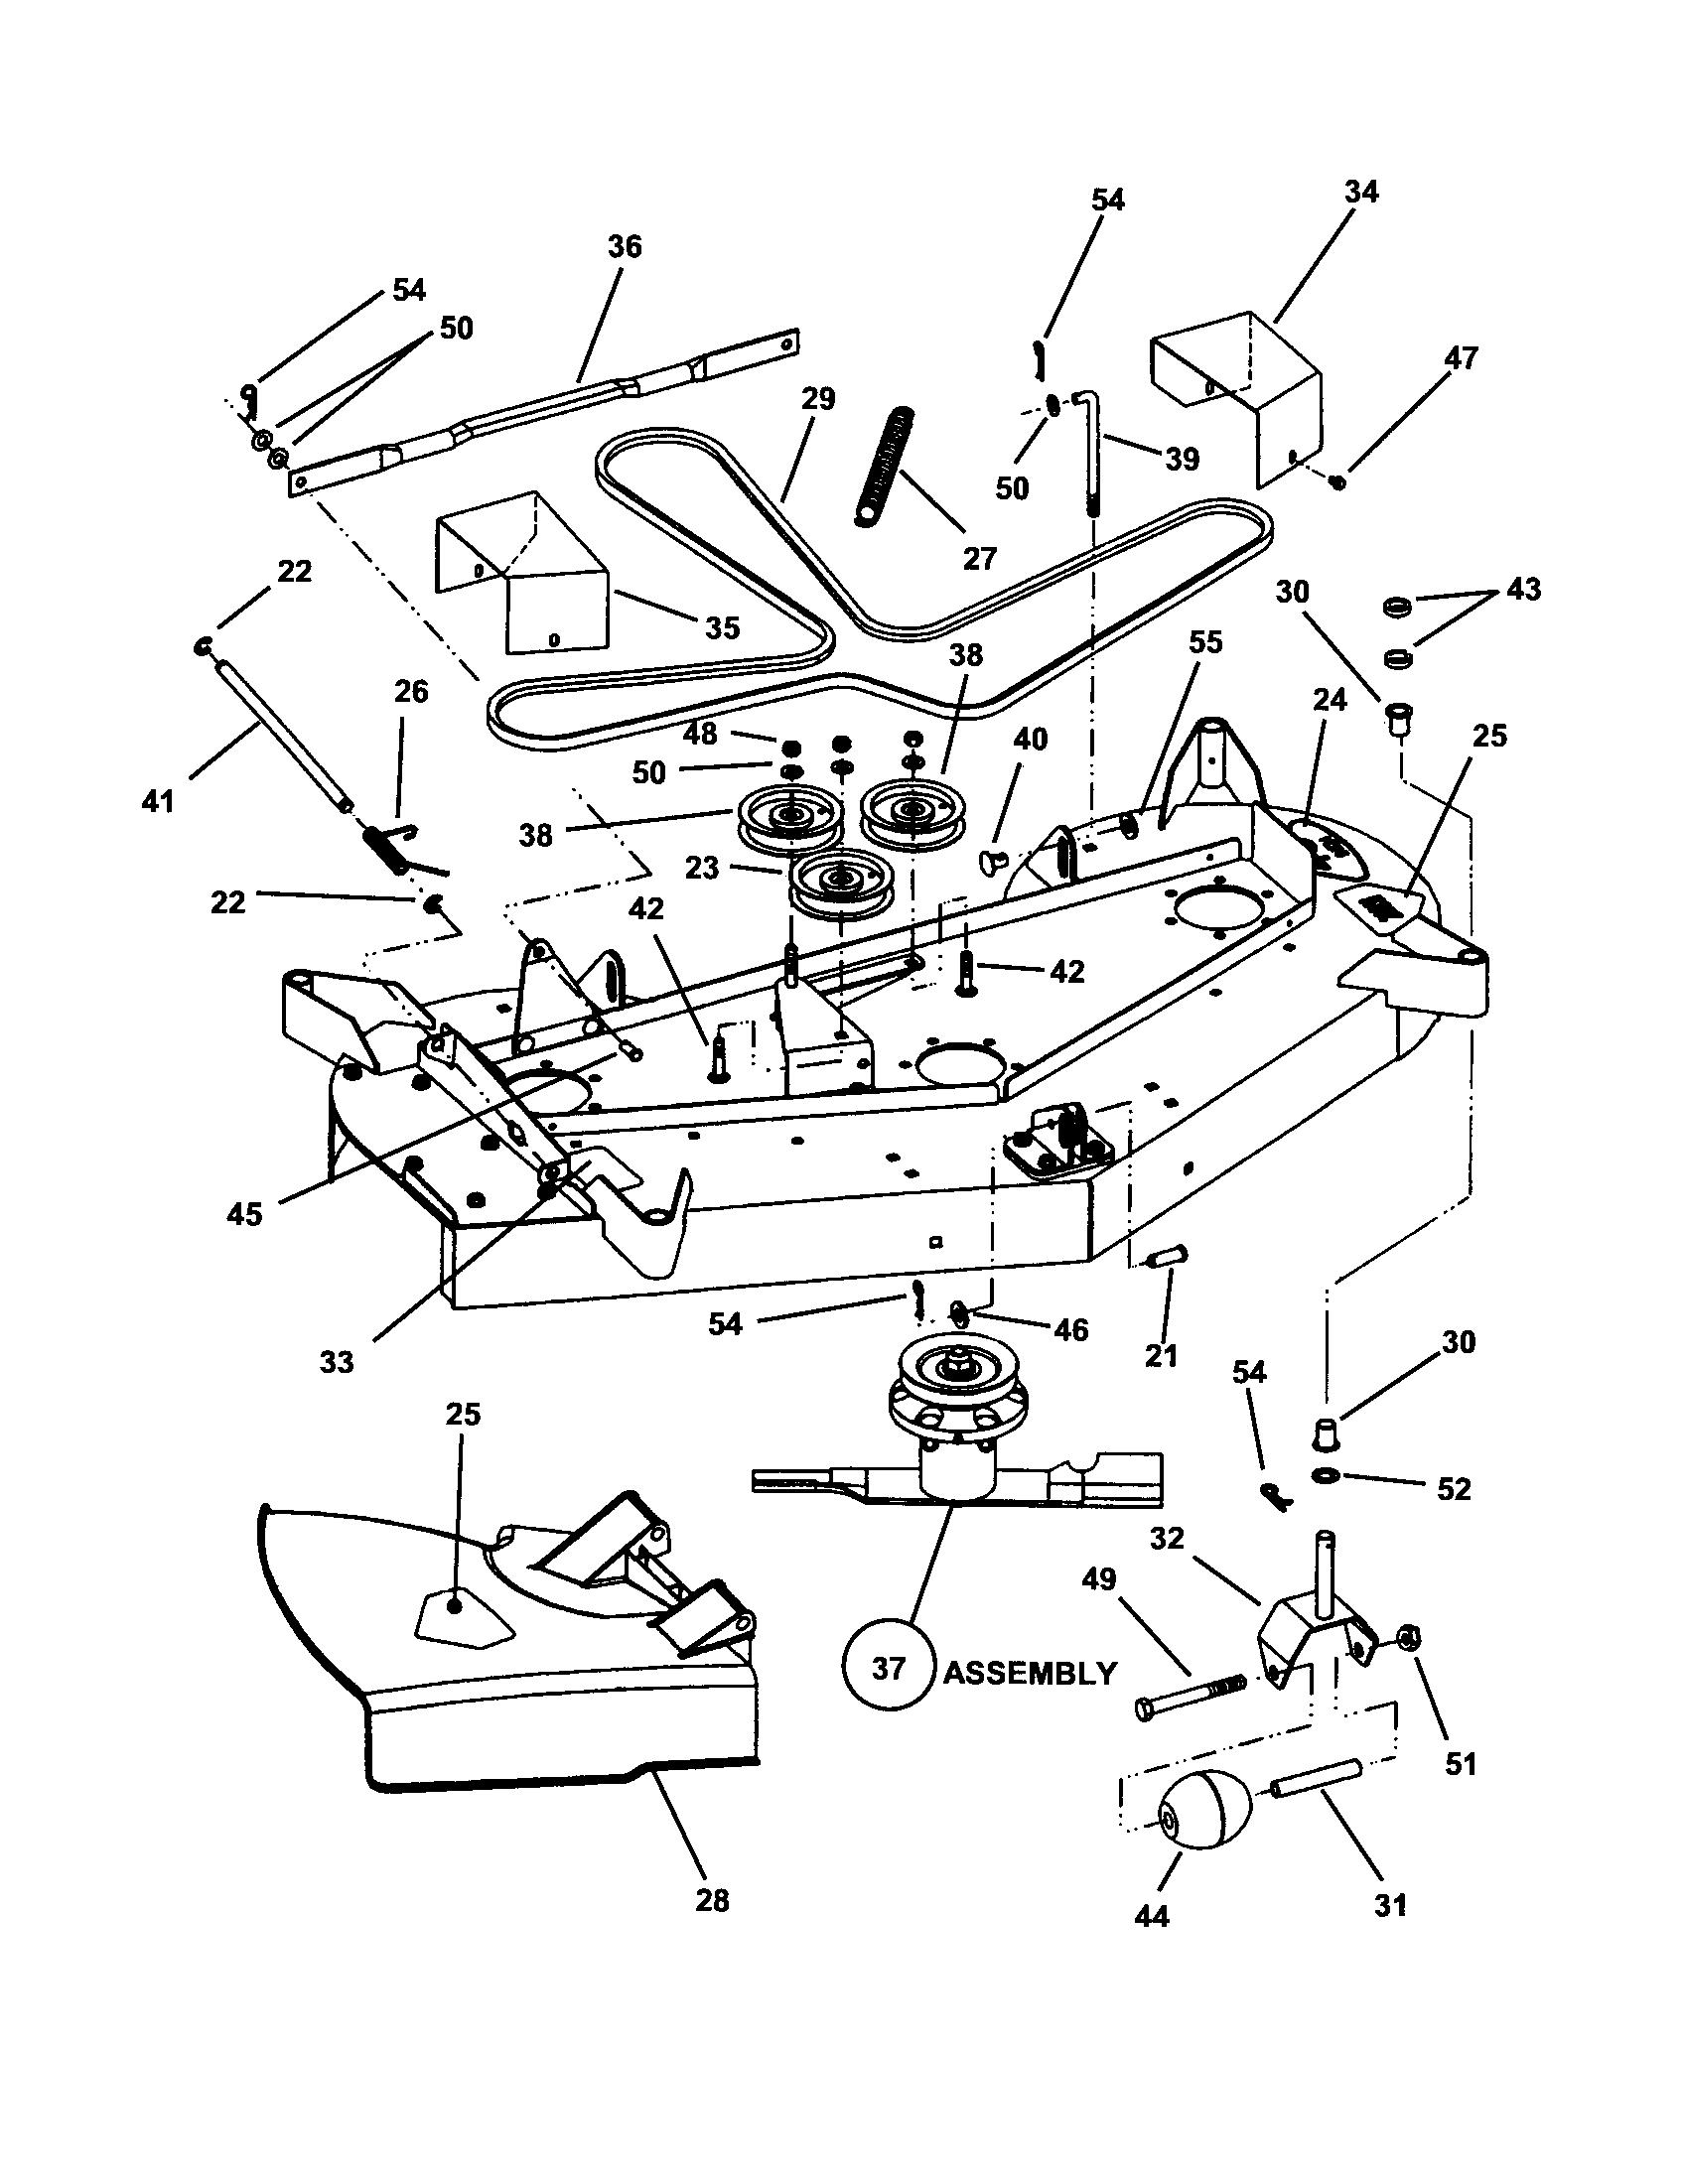 hight resolution of snapper hzs14331bve 48 mower deck diagram